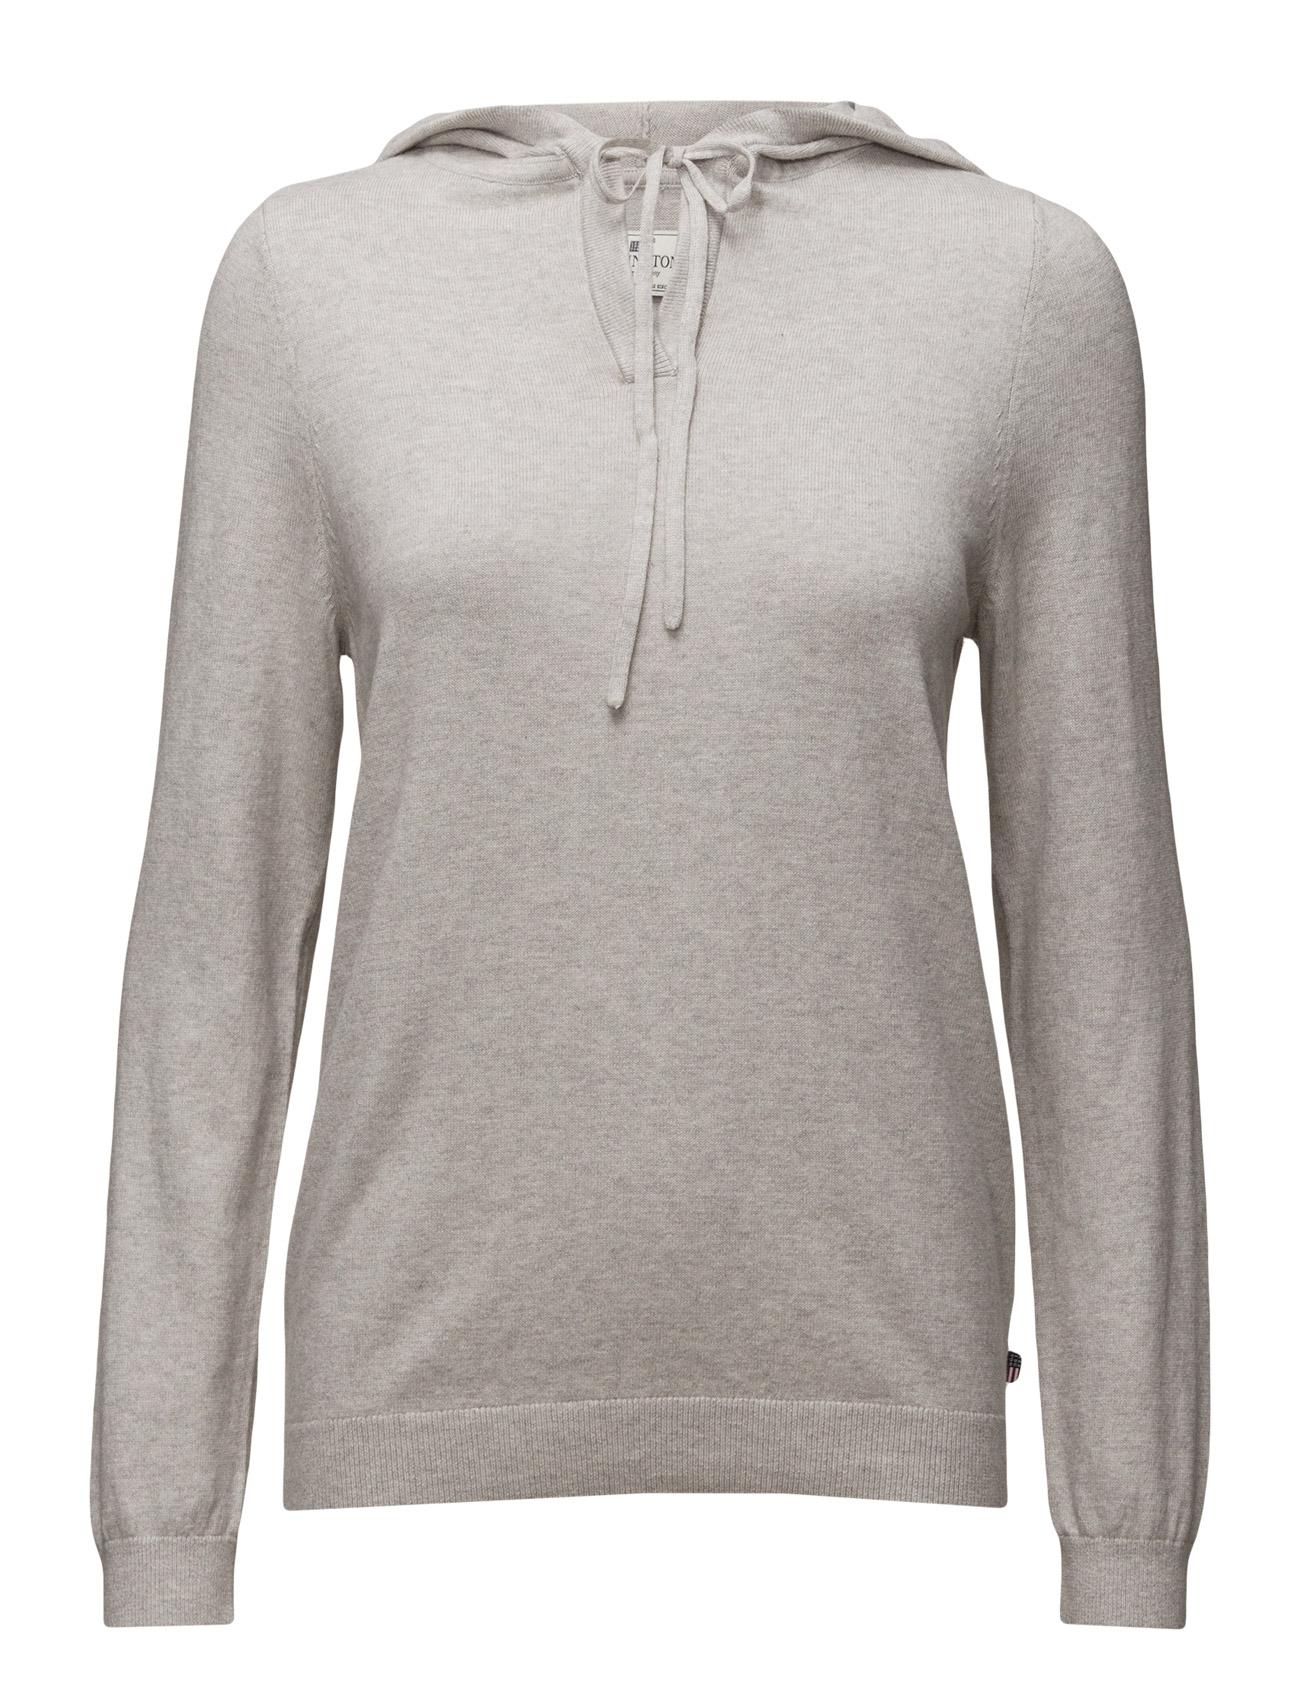 Bree Knitted Hood Lexington Company Sweatshirts til Kvinder i Lt Warm Gray Mel